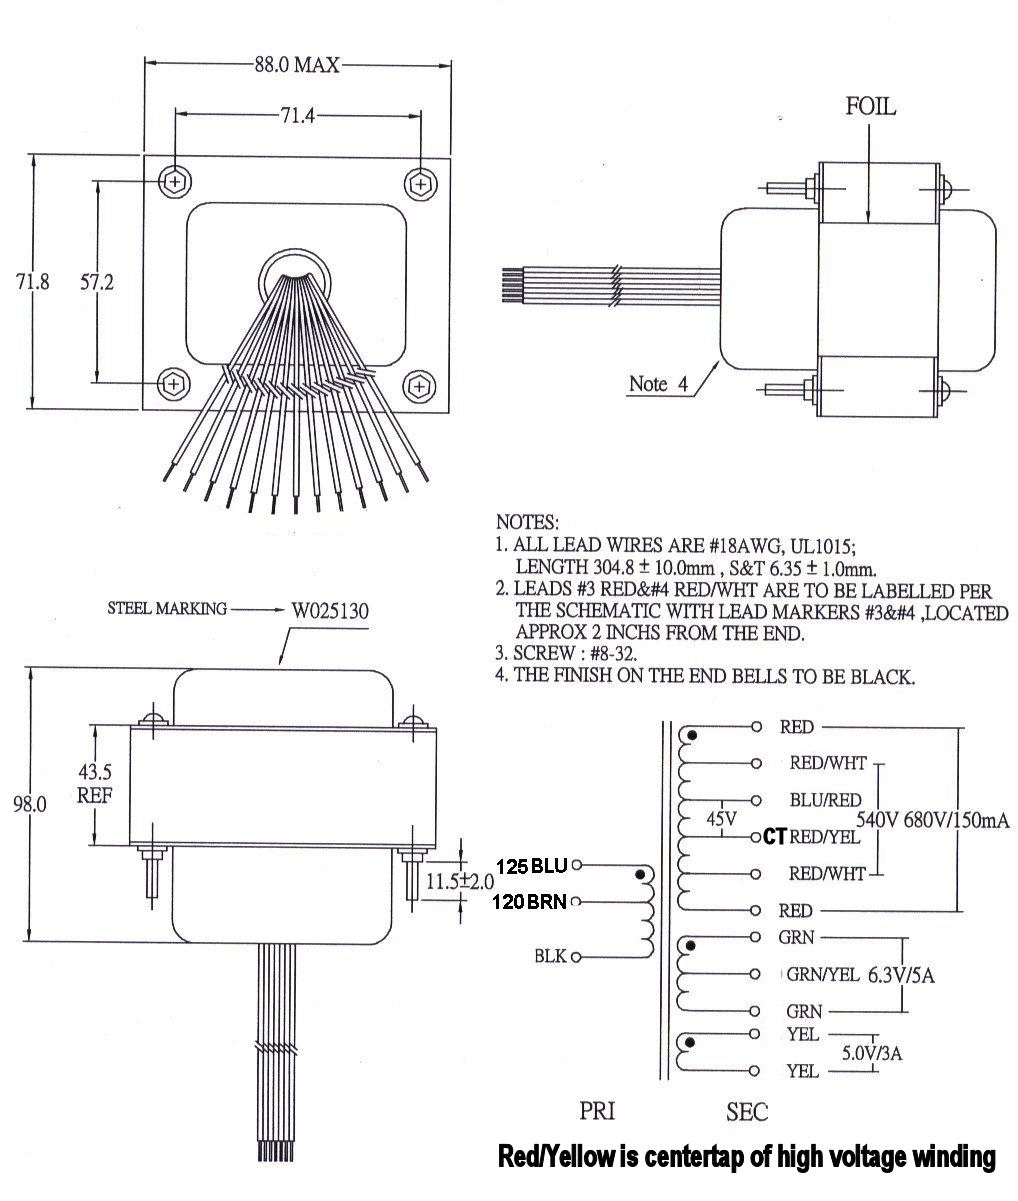 W025130 Transformer Usa Power Wiring Diagram Click For Specs